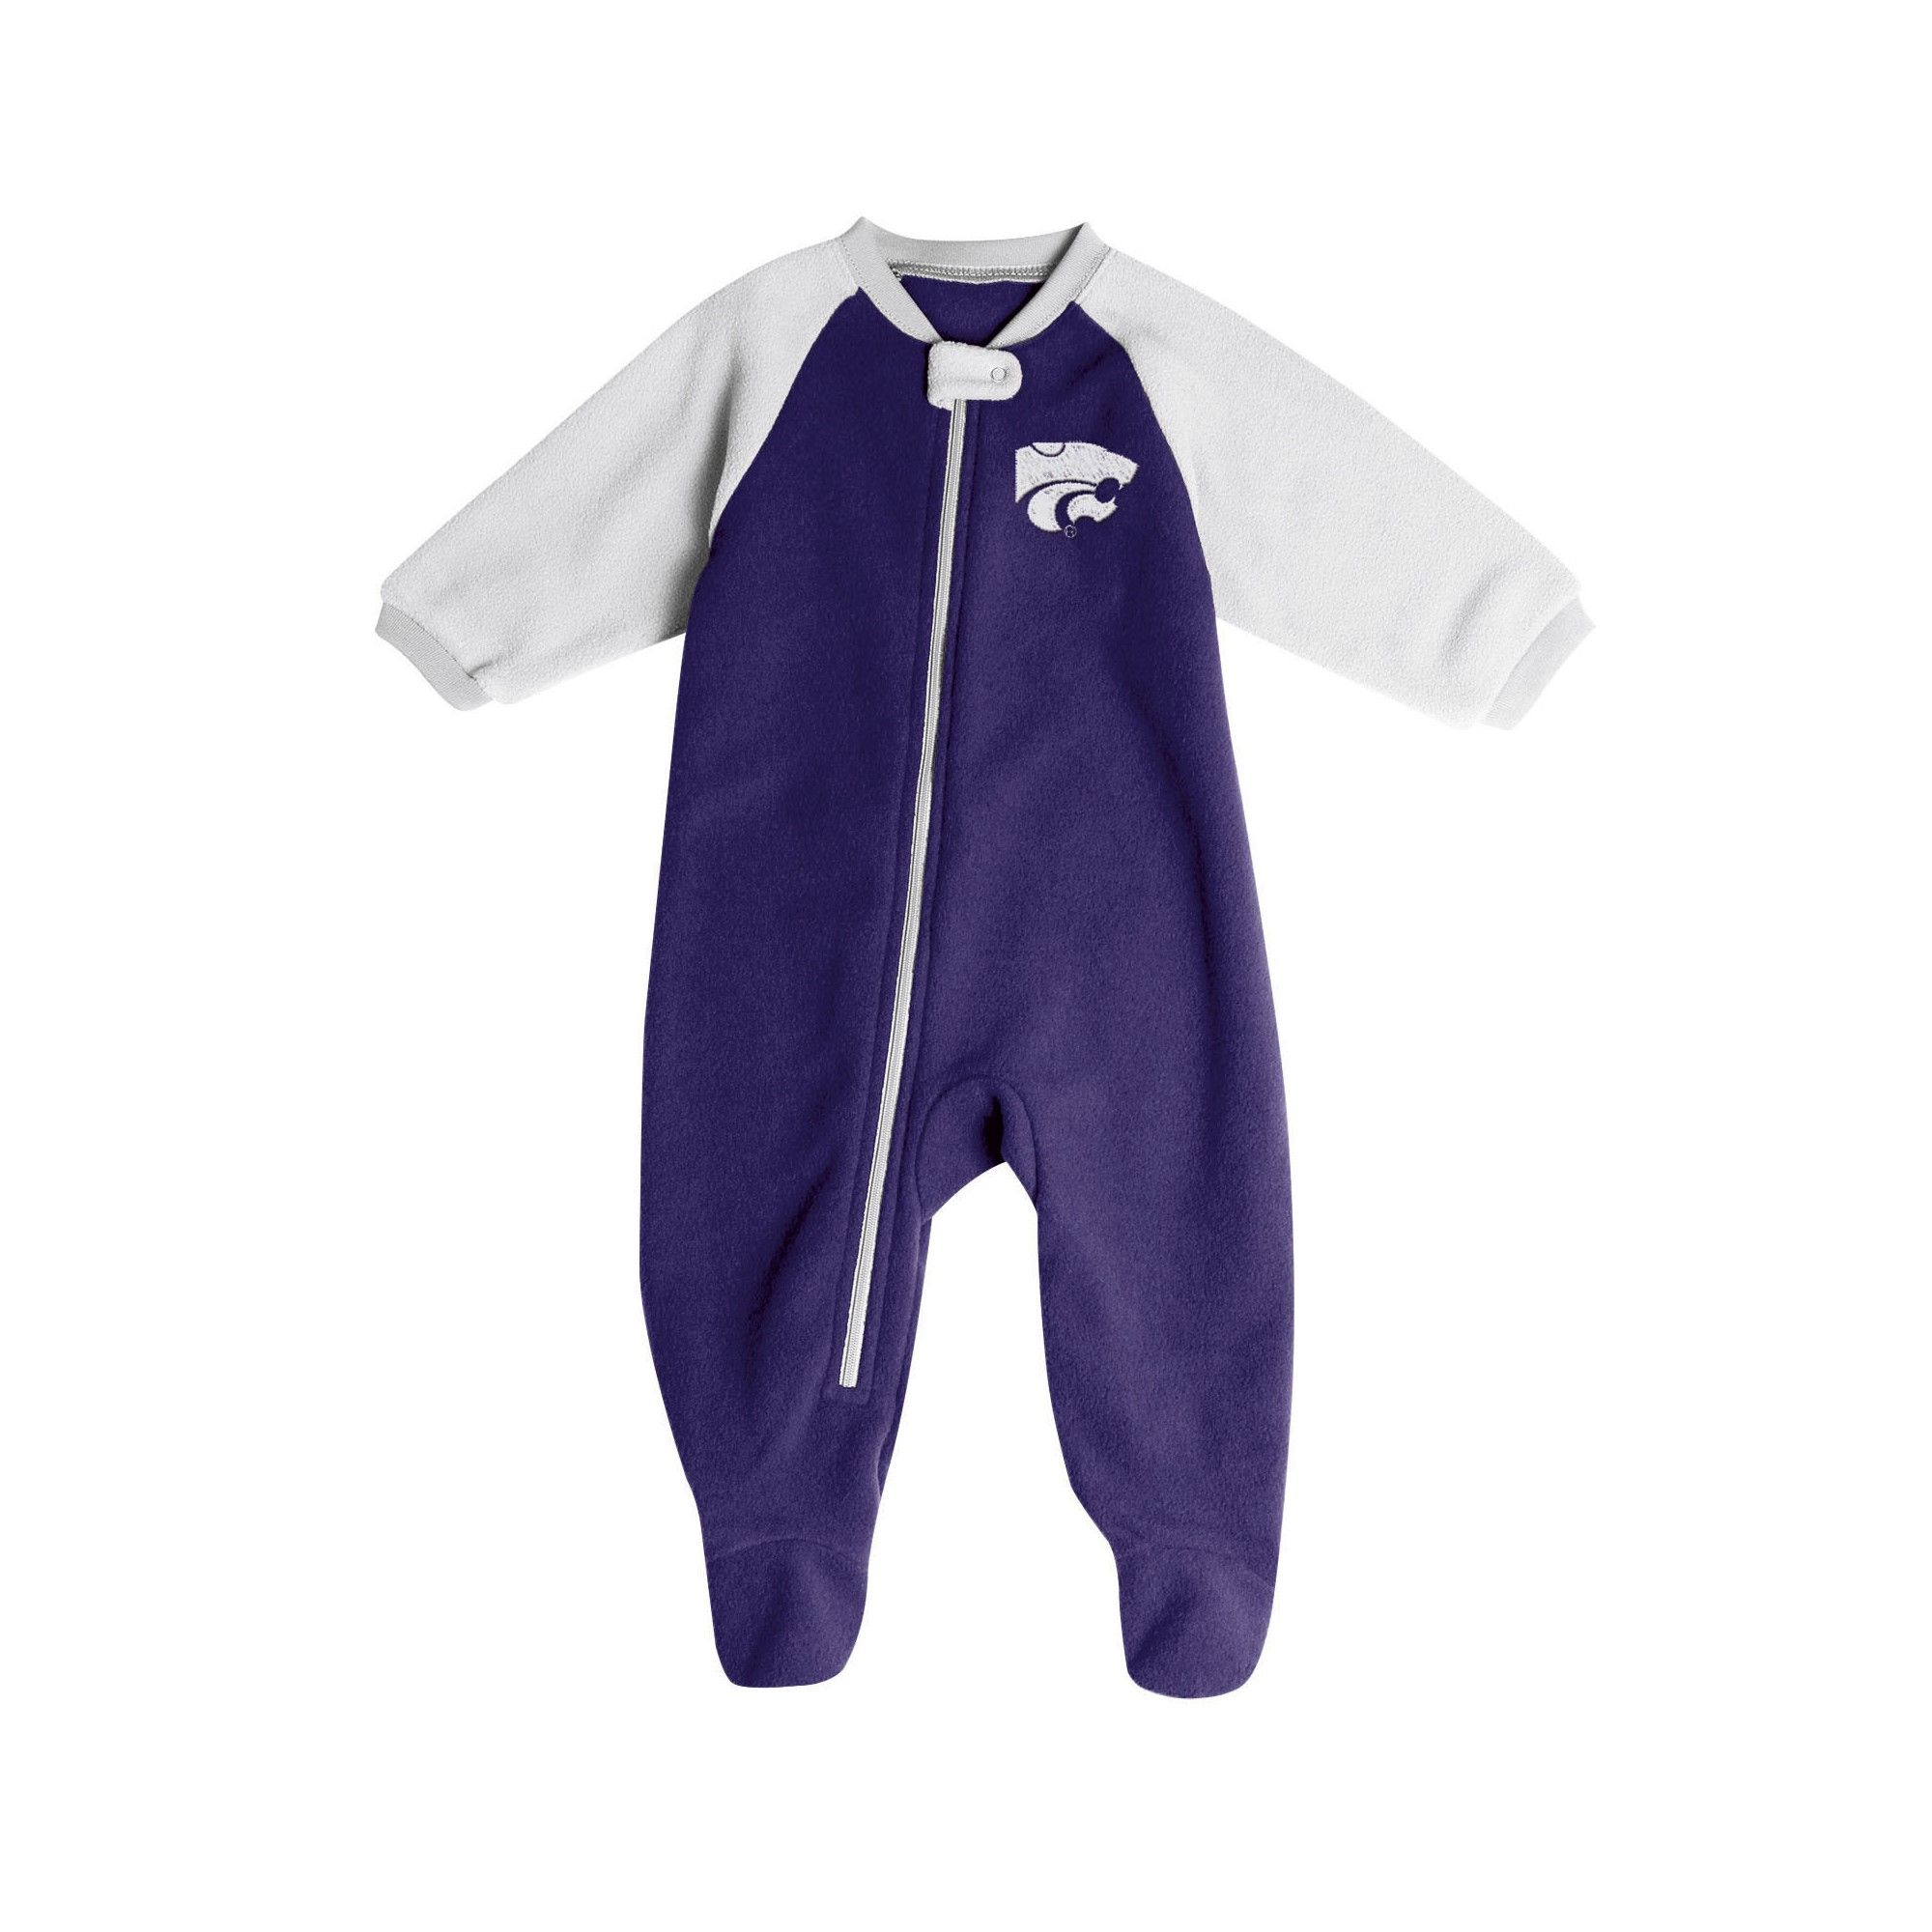 8b722cbef Kansas State Wildcats Baby Boys  Long Sleeve Blanket Sleeper - 3-6M ...